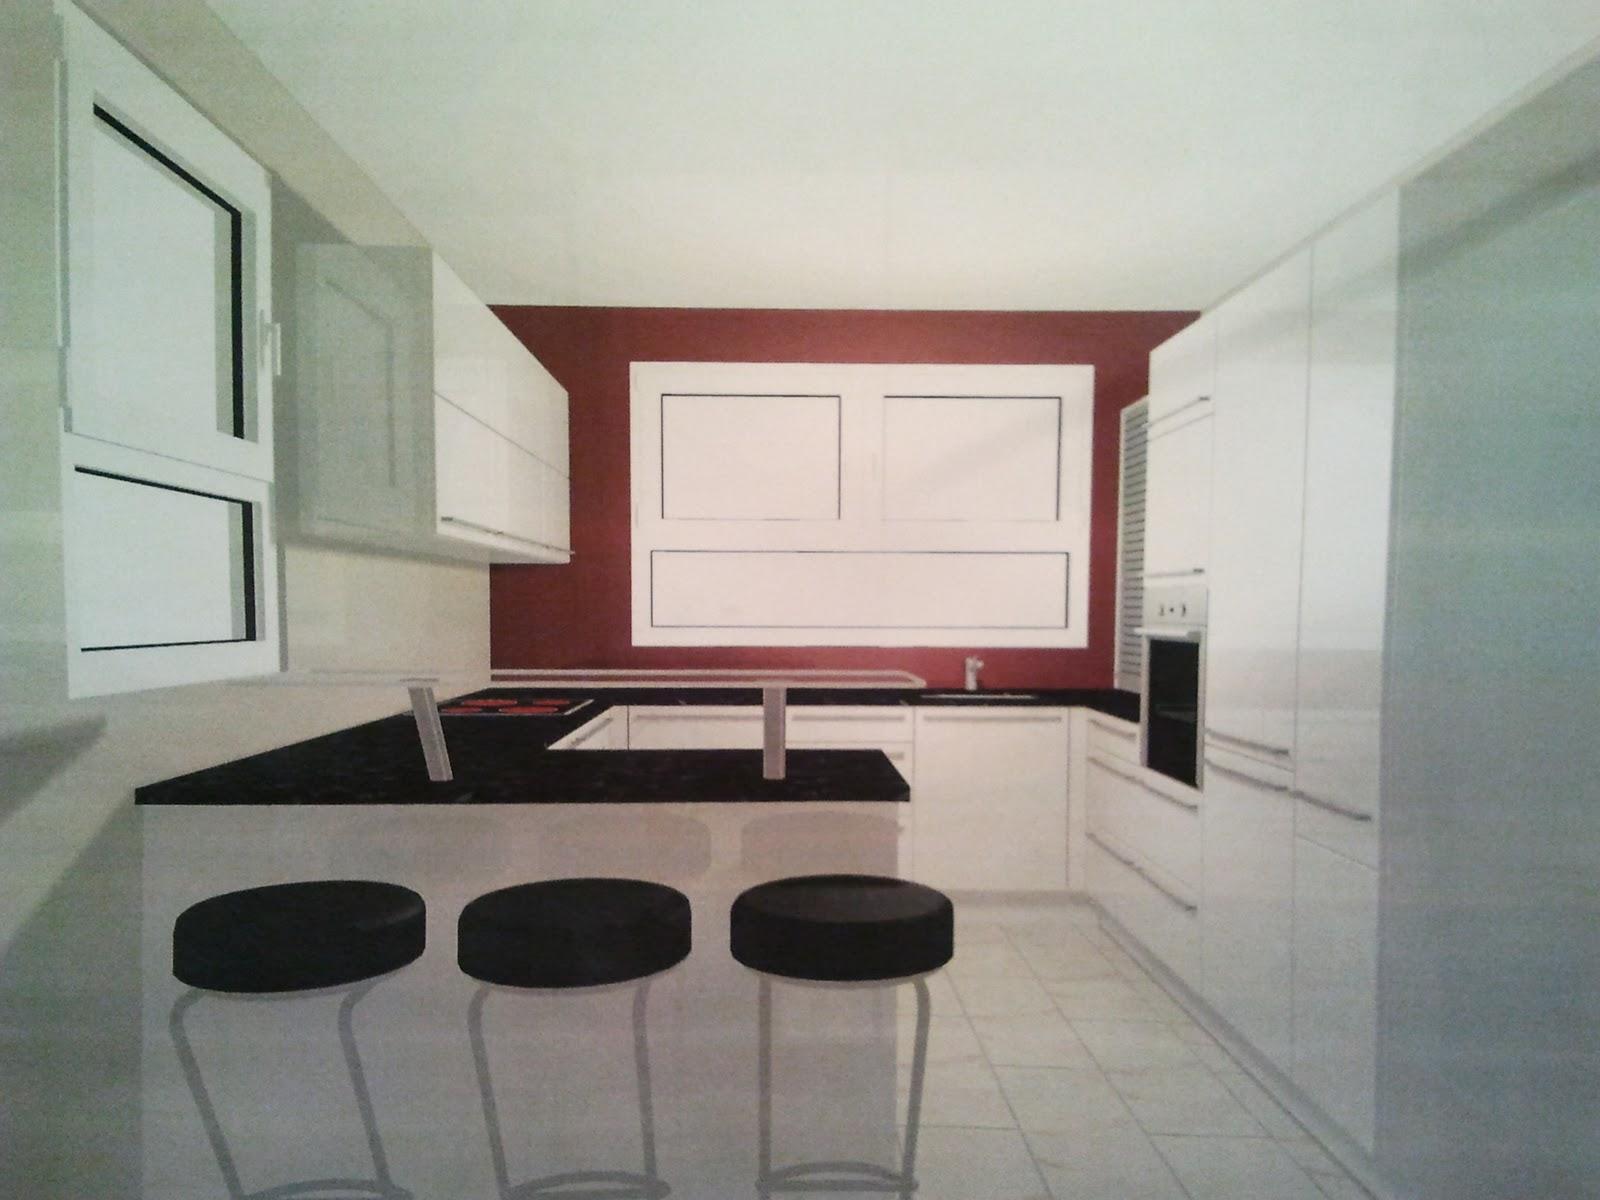 building a dream der weg zu unserem haus dezember 2011. Black Bedroom Furniture Sets. Home Design Ideas